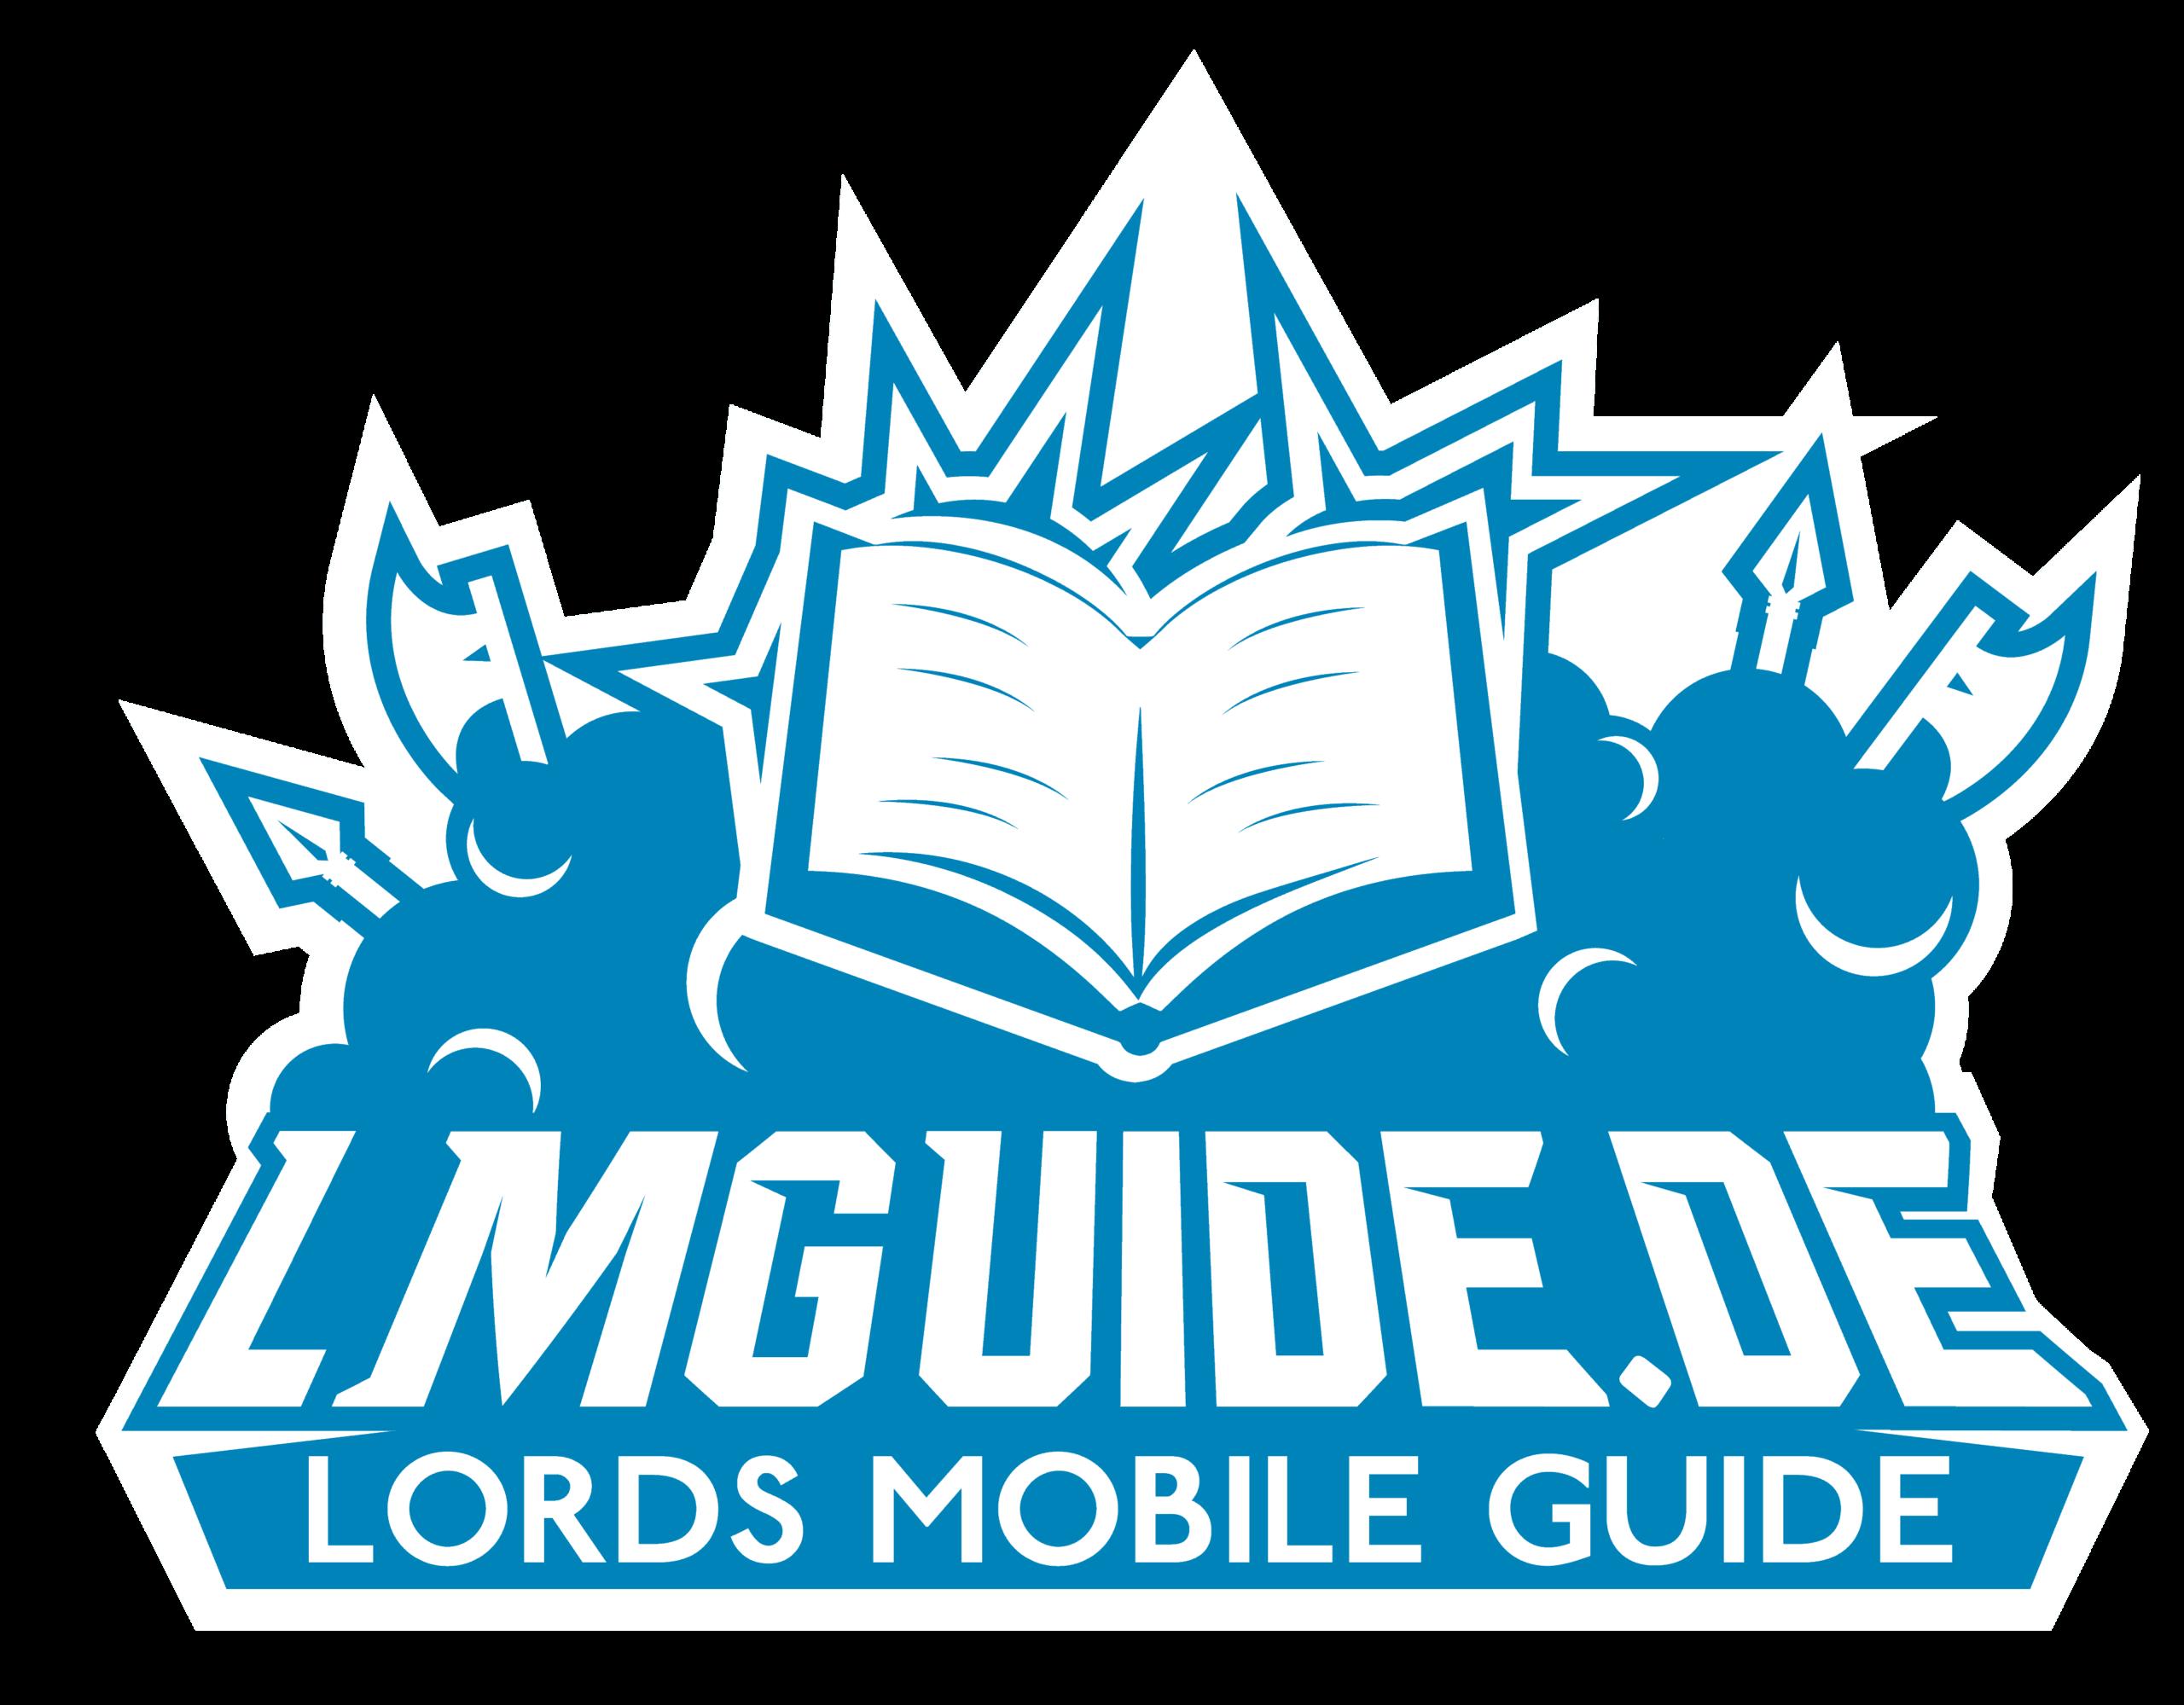 Anfänger Leitfaden für Lords Mobile